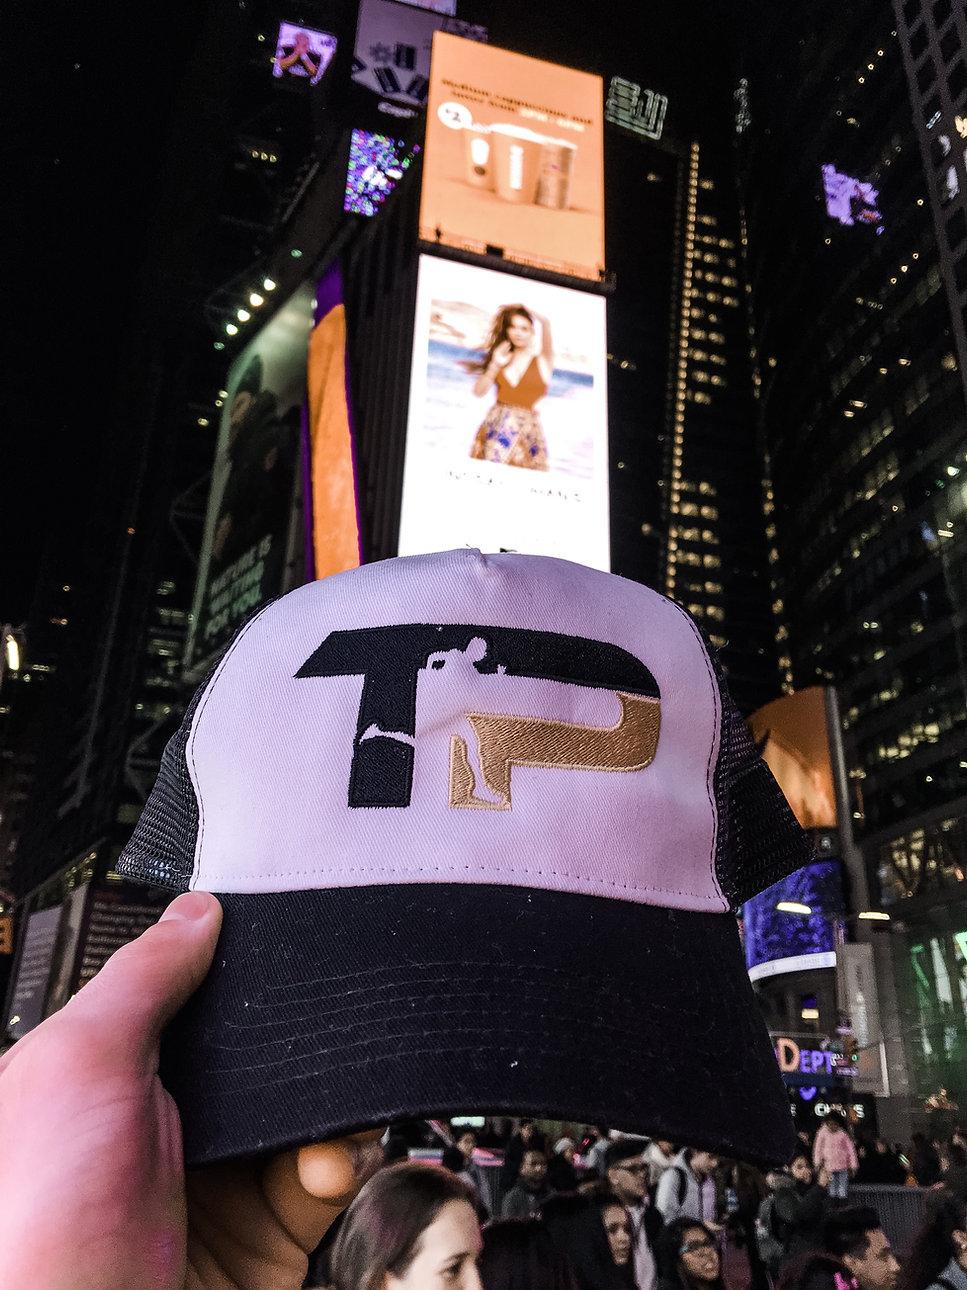 TP HAT PIC TIMES SQUARE.JPEG